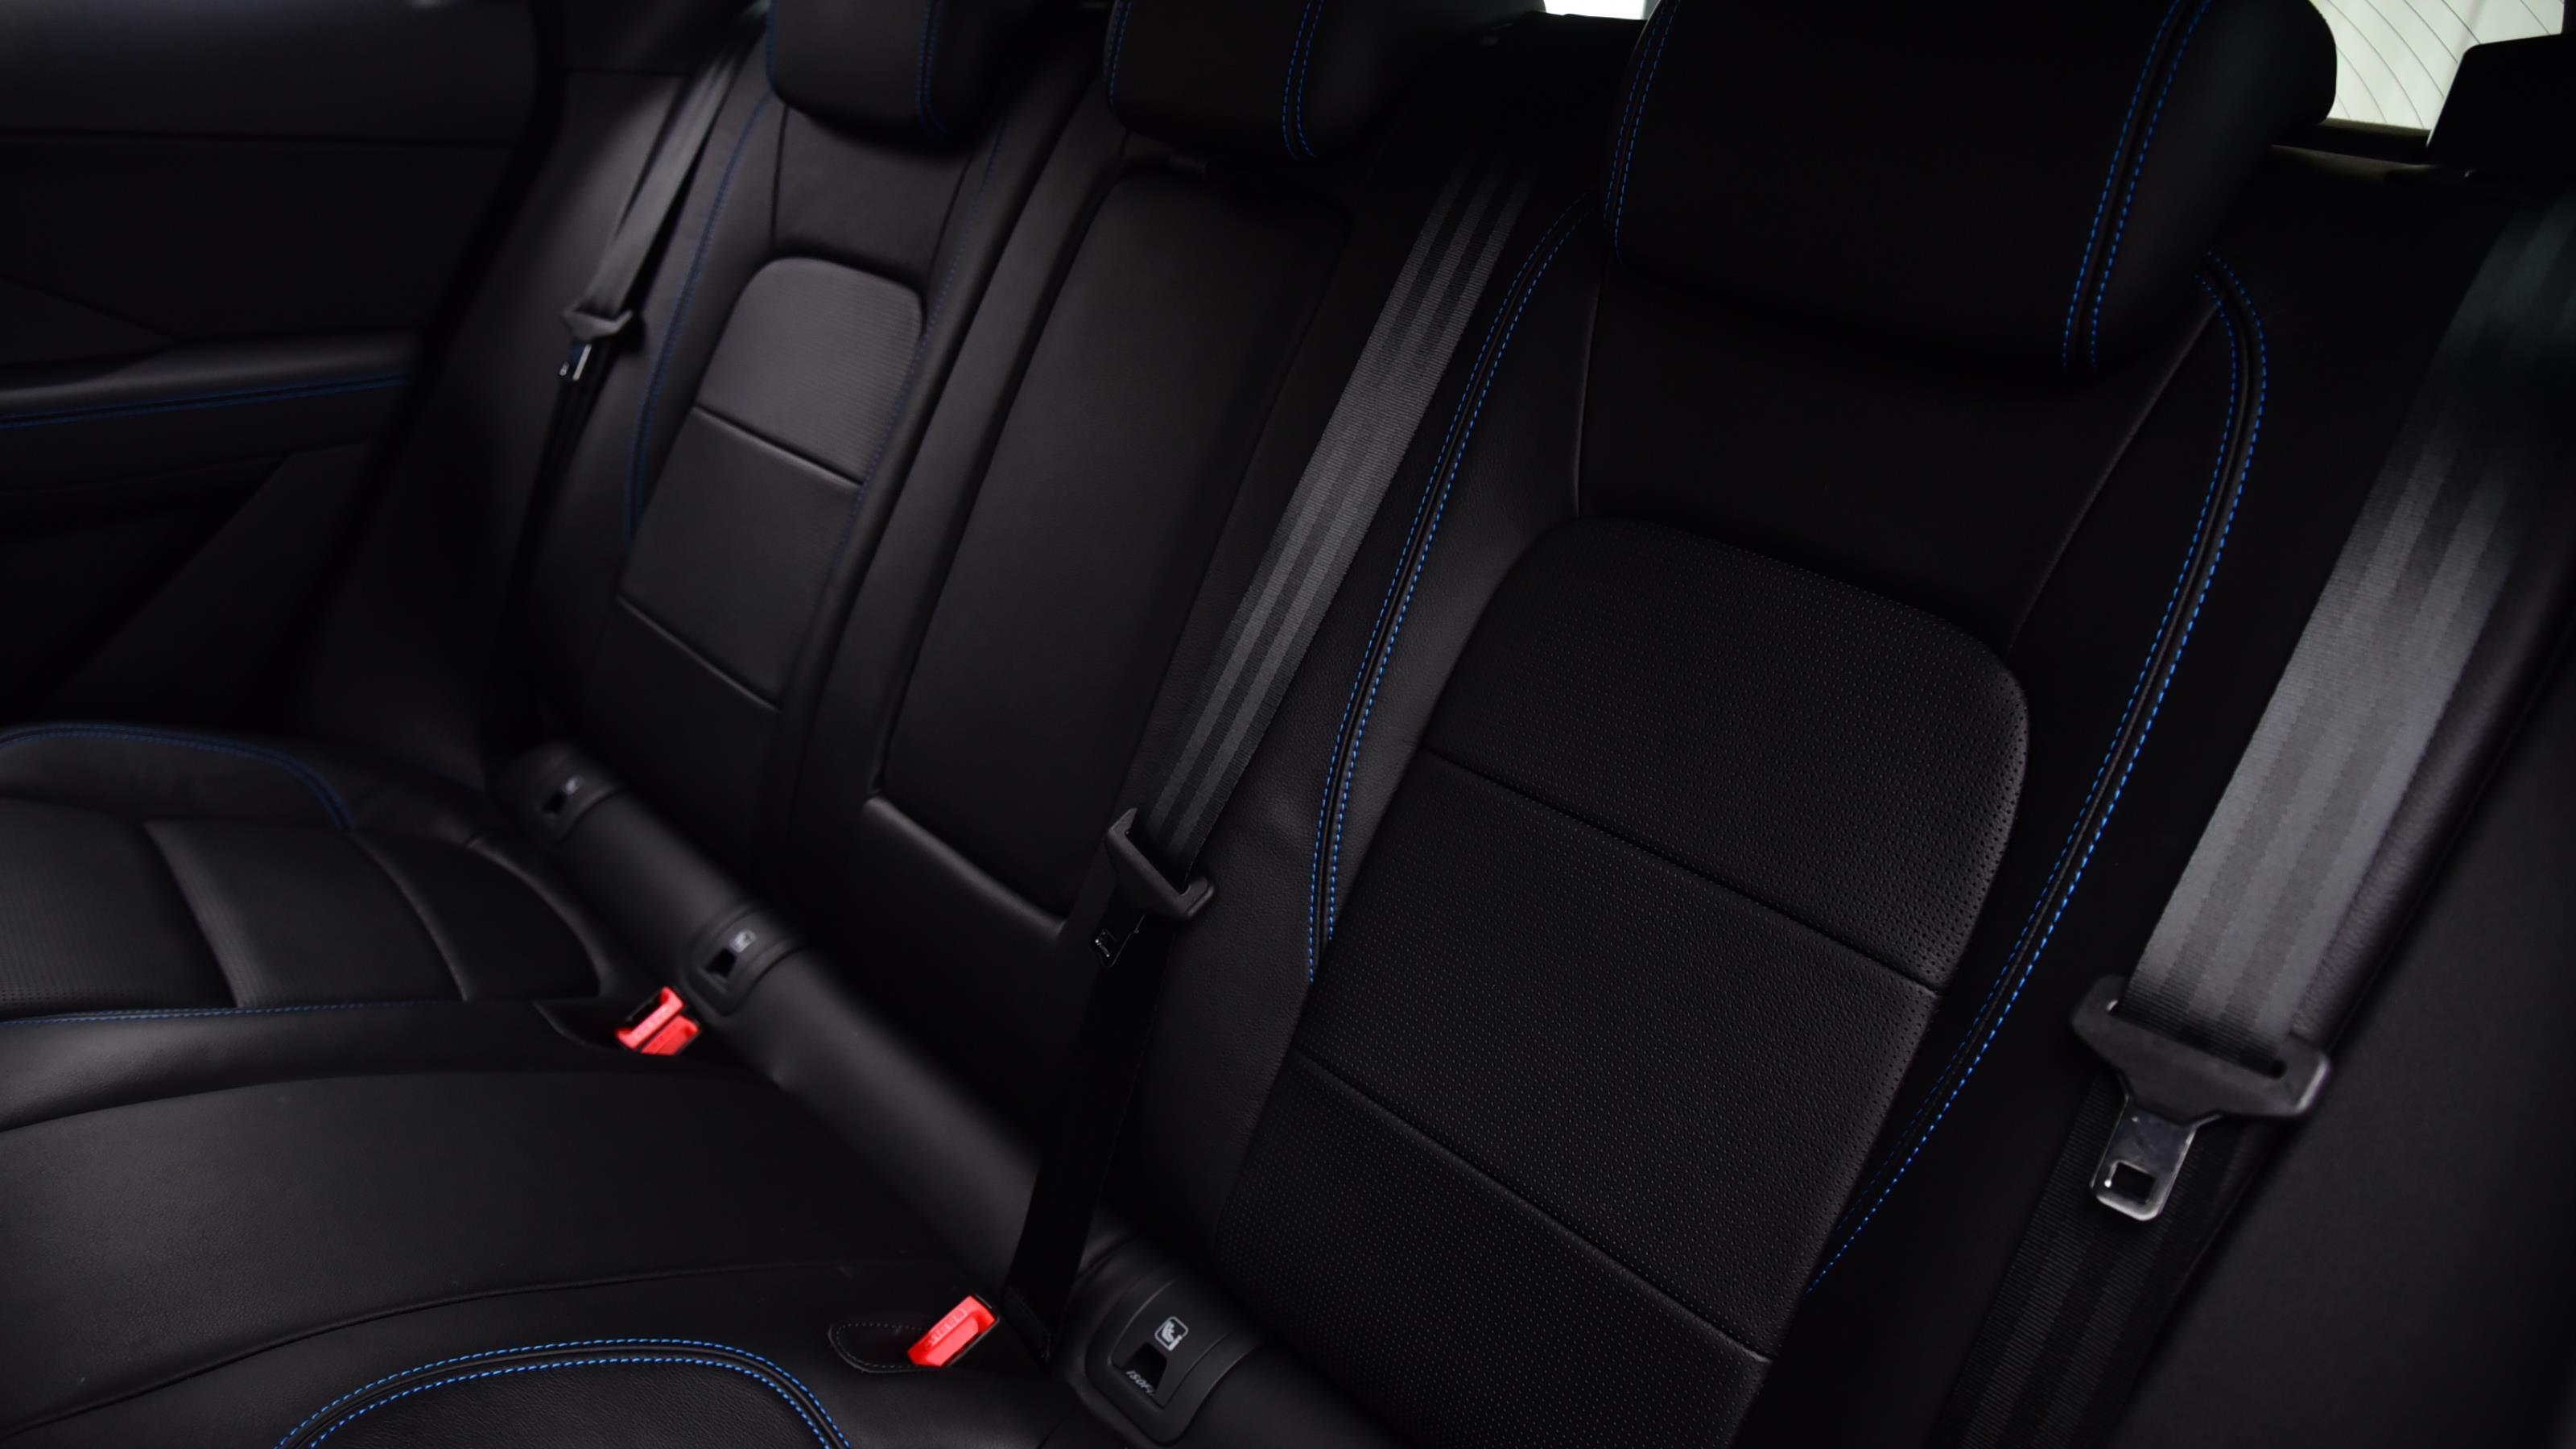 Used 2018 Jaguar E-PACE 2.0 R-Dynamic S 5dr Auto Black at Saxton4x4